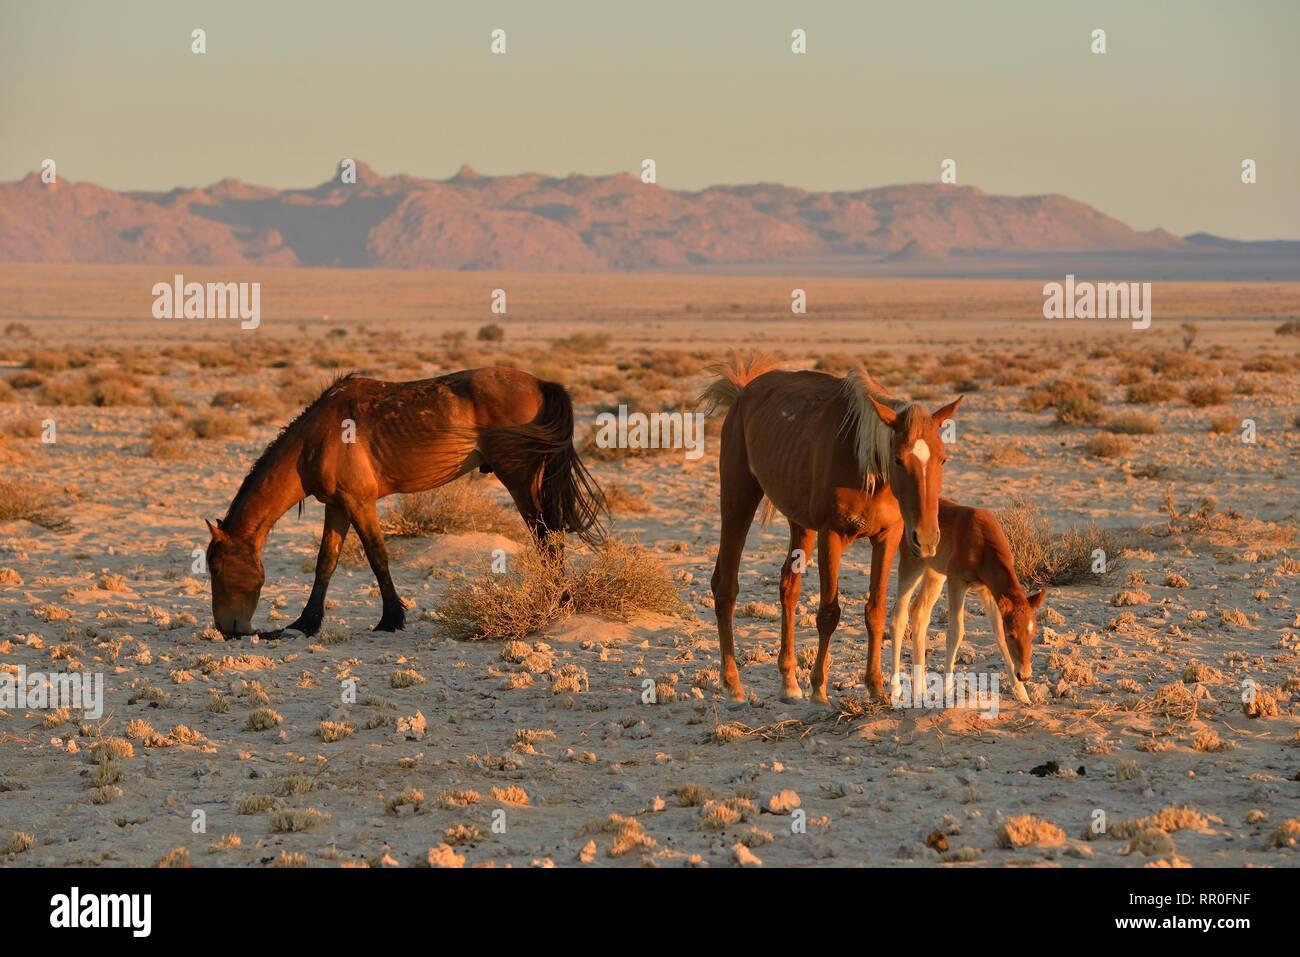 Zoología, mamíferos (Mammalia), el desierto de Namib, Namibia del caballo El caballo salvaje o el Namib (Equus ferus) cerca de el, Additional-Rights-Clearance-Info-Not-Available Foto de stock